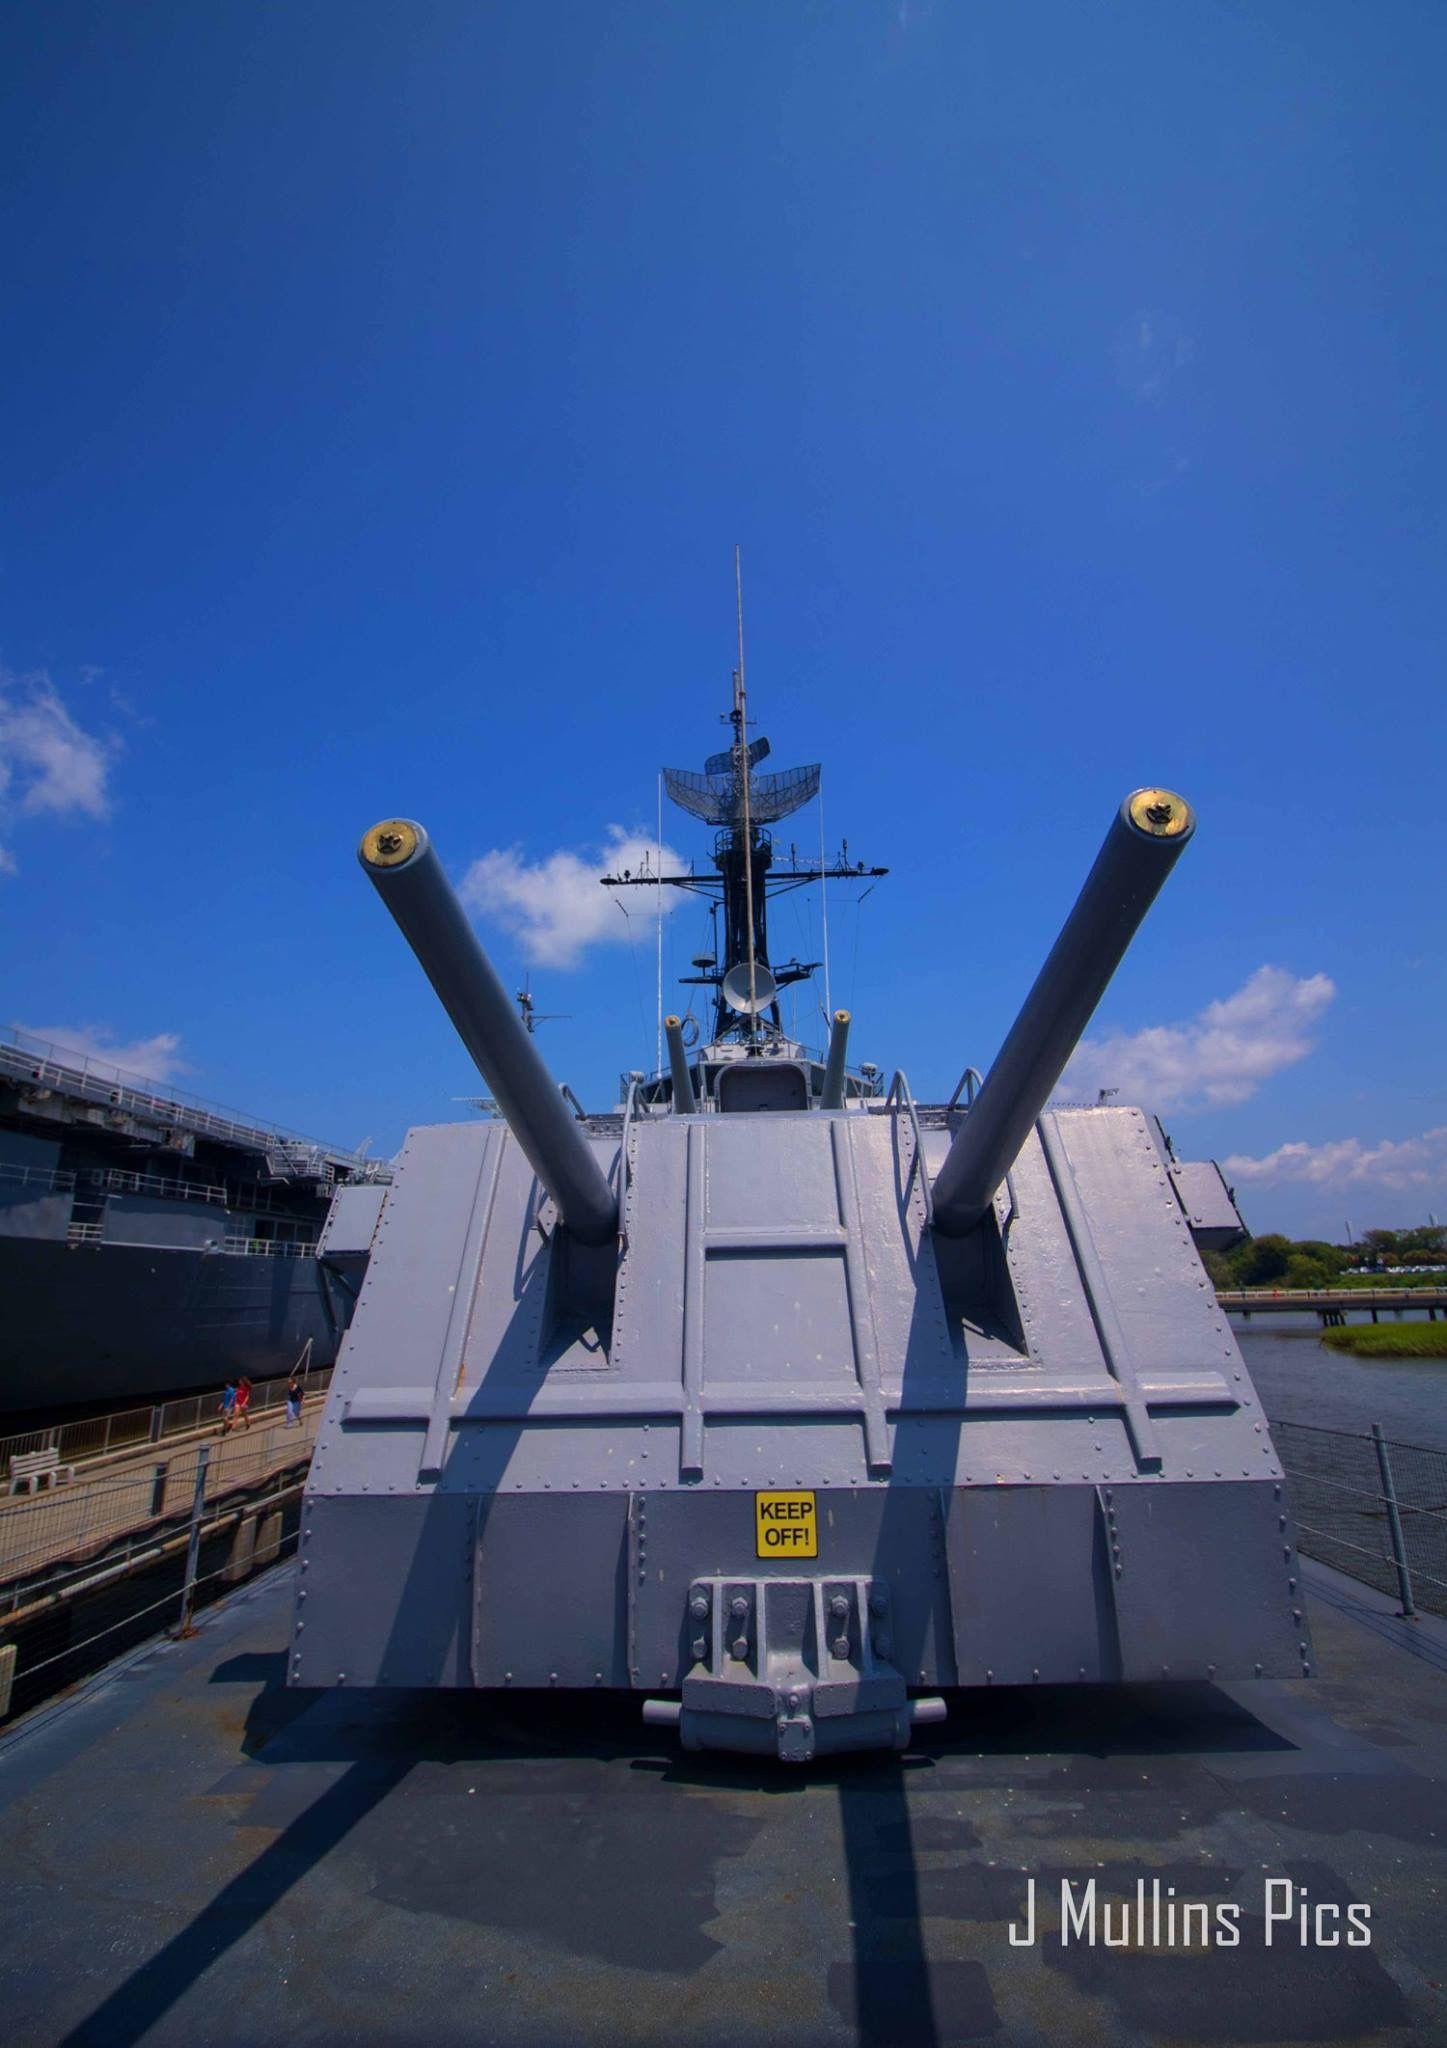 Patriots Point Charleston South Carolina Uss Yorktown Aircraft Carrier Uss Laffey Destroyer Uss Clamagore Submarin Uss Yorktown Uss Laffey Aircraft Carrier